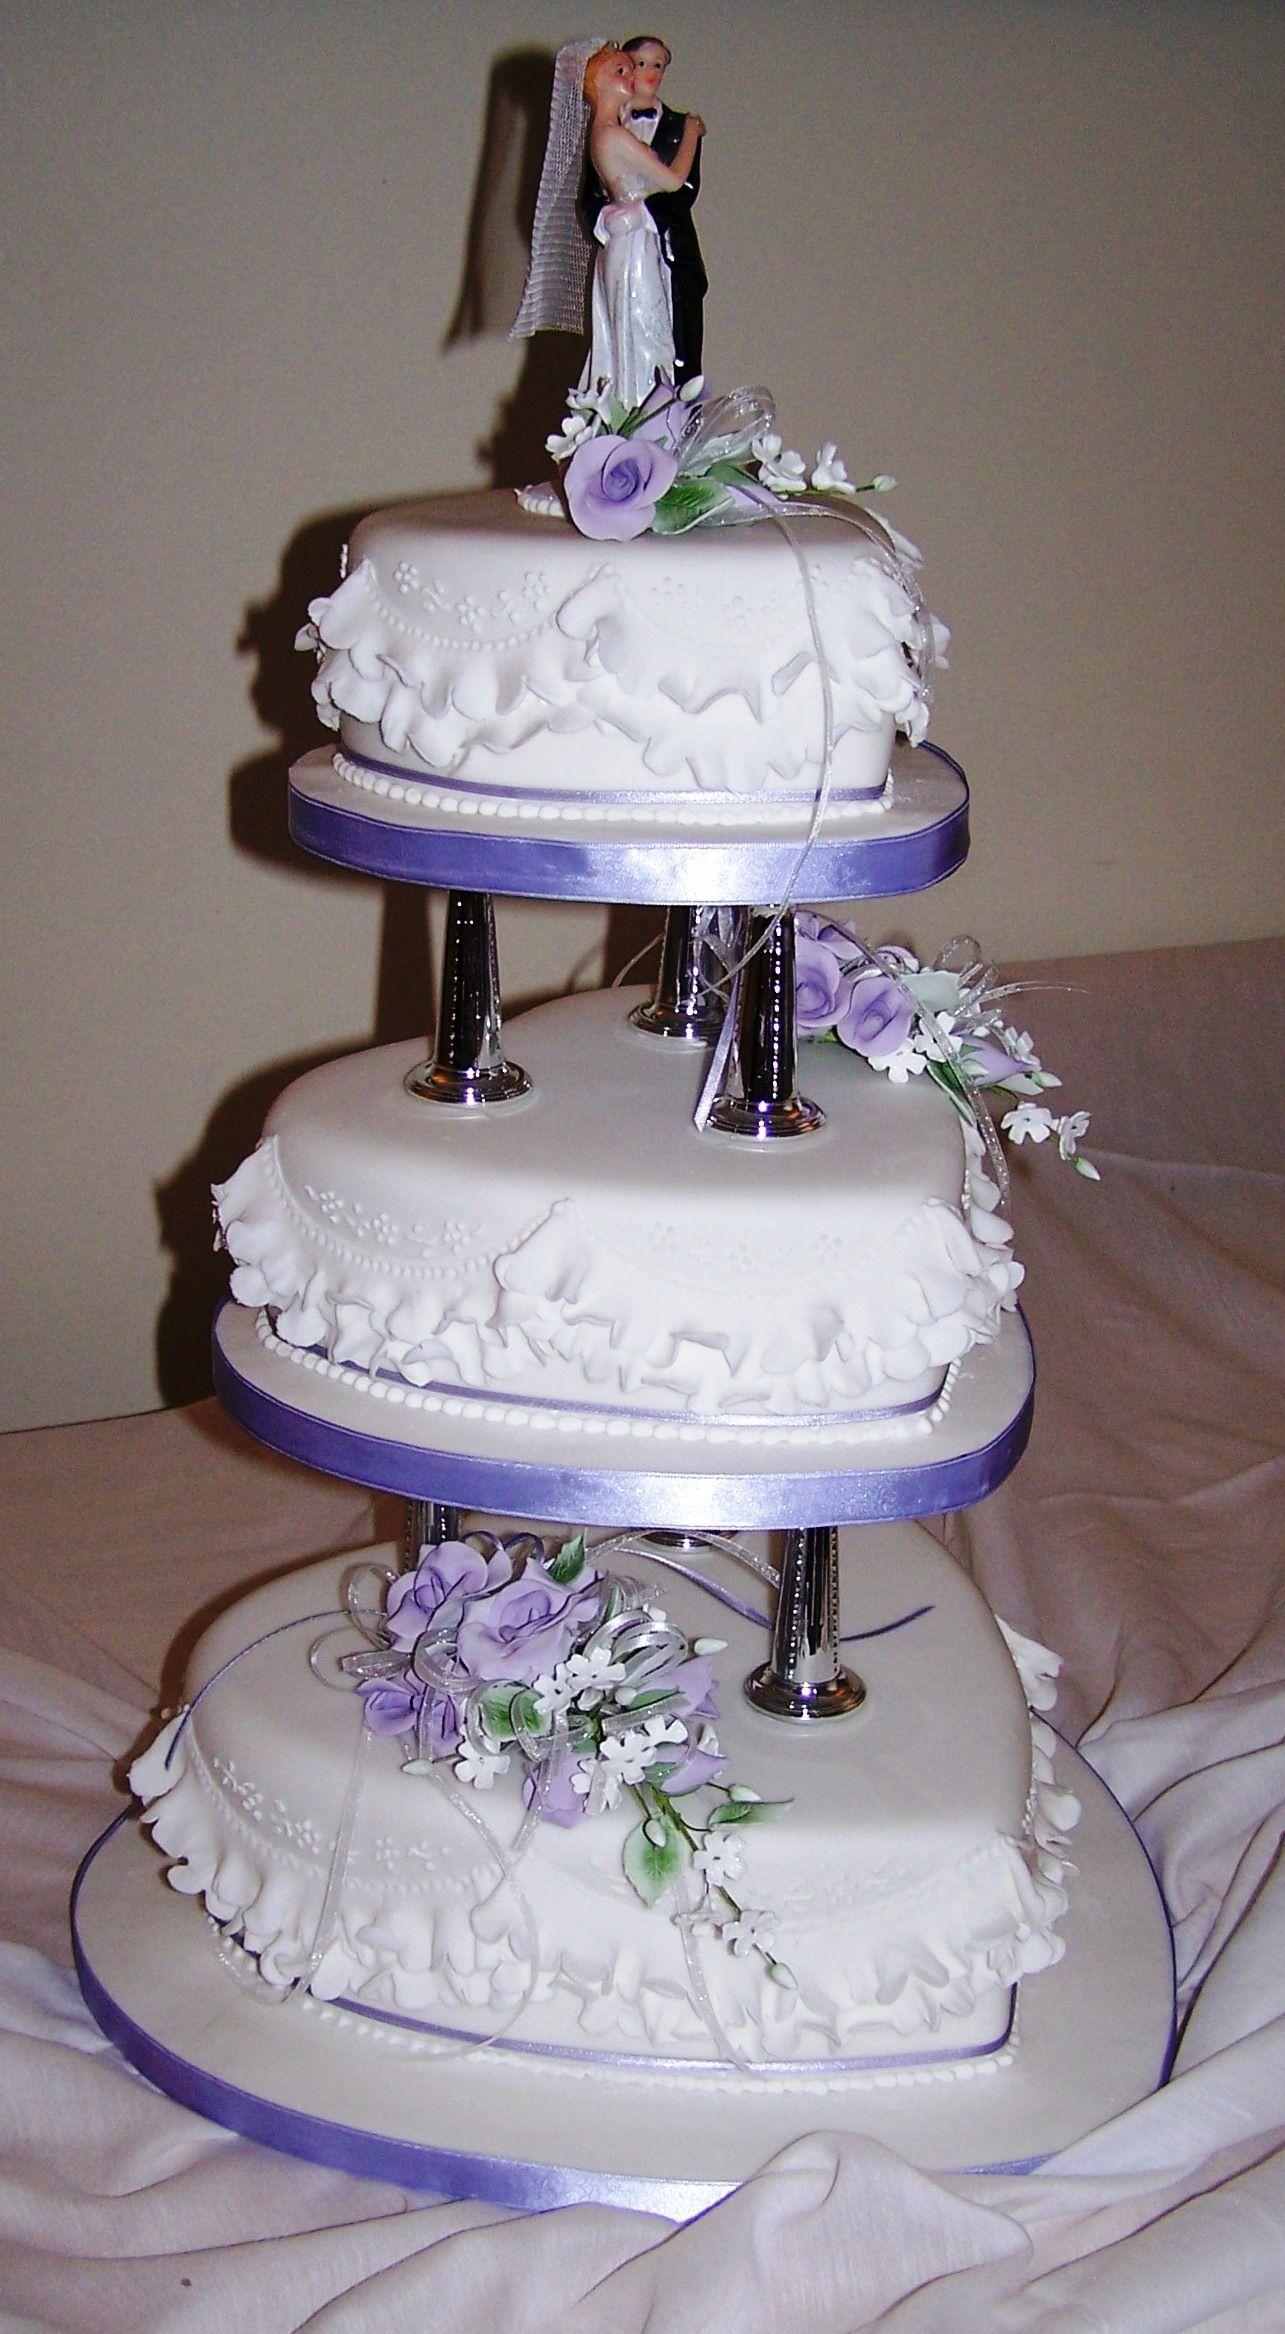 3 Tier Traditional Wedding Cake With Garrett Frills Sugar Roses